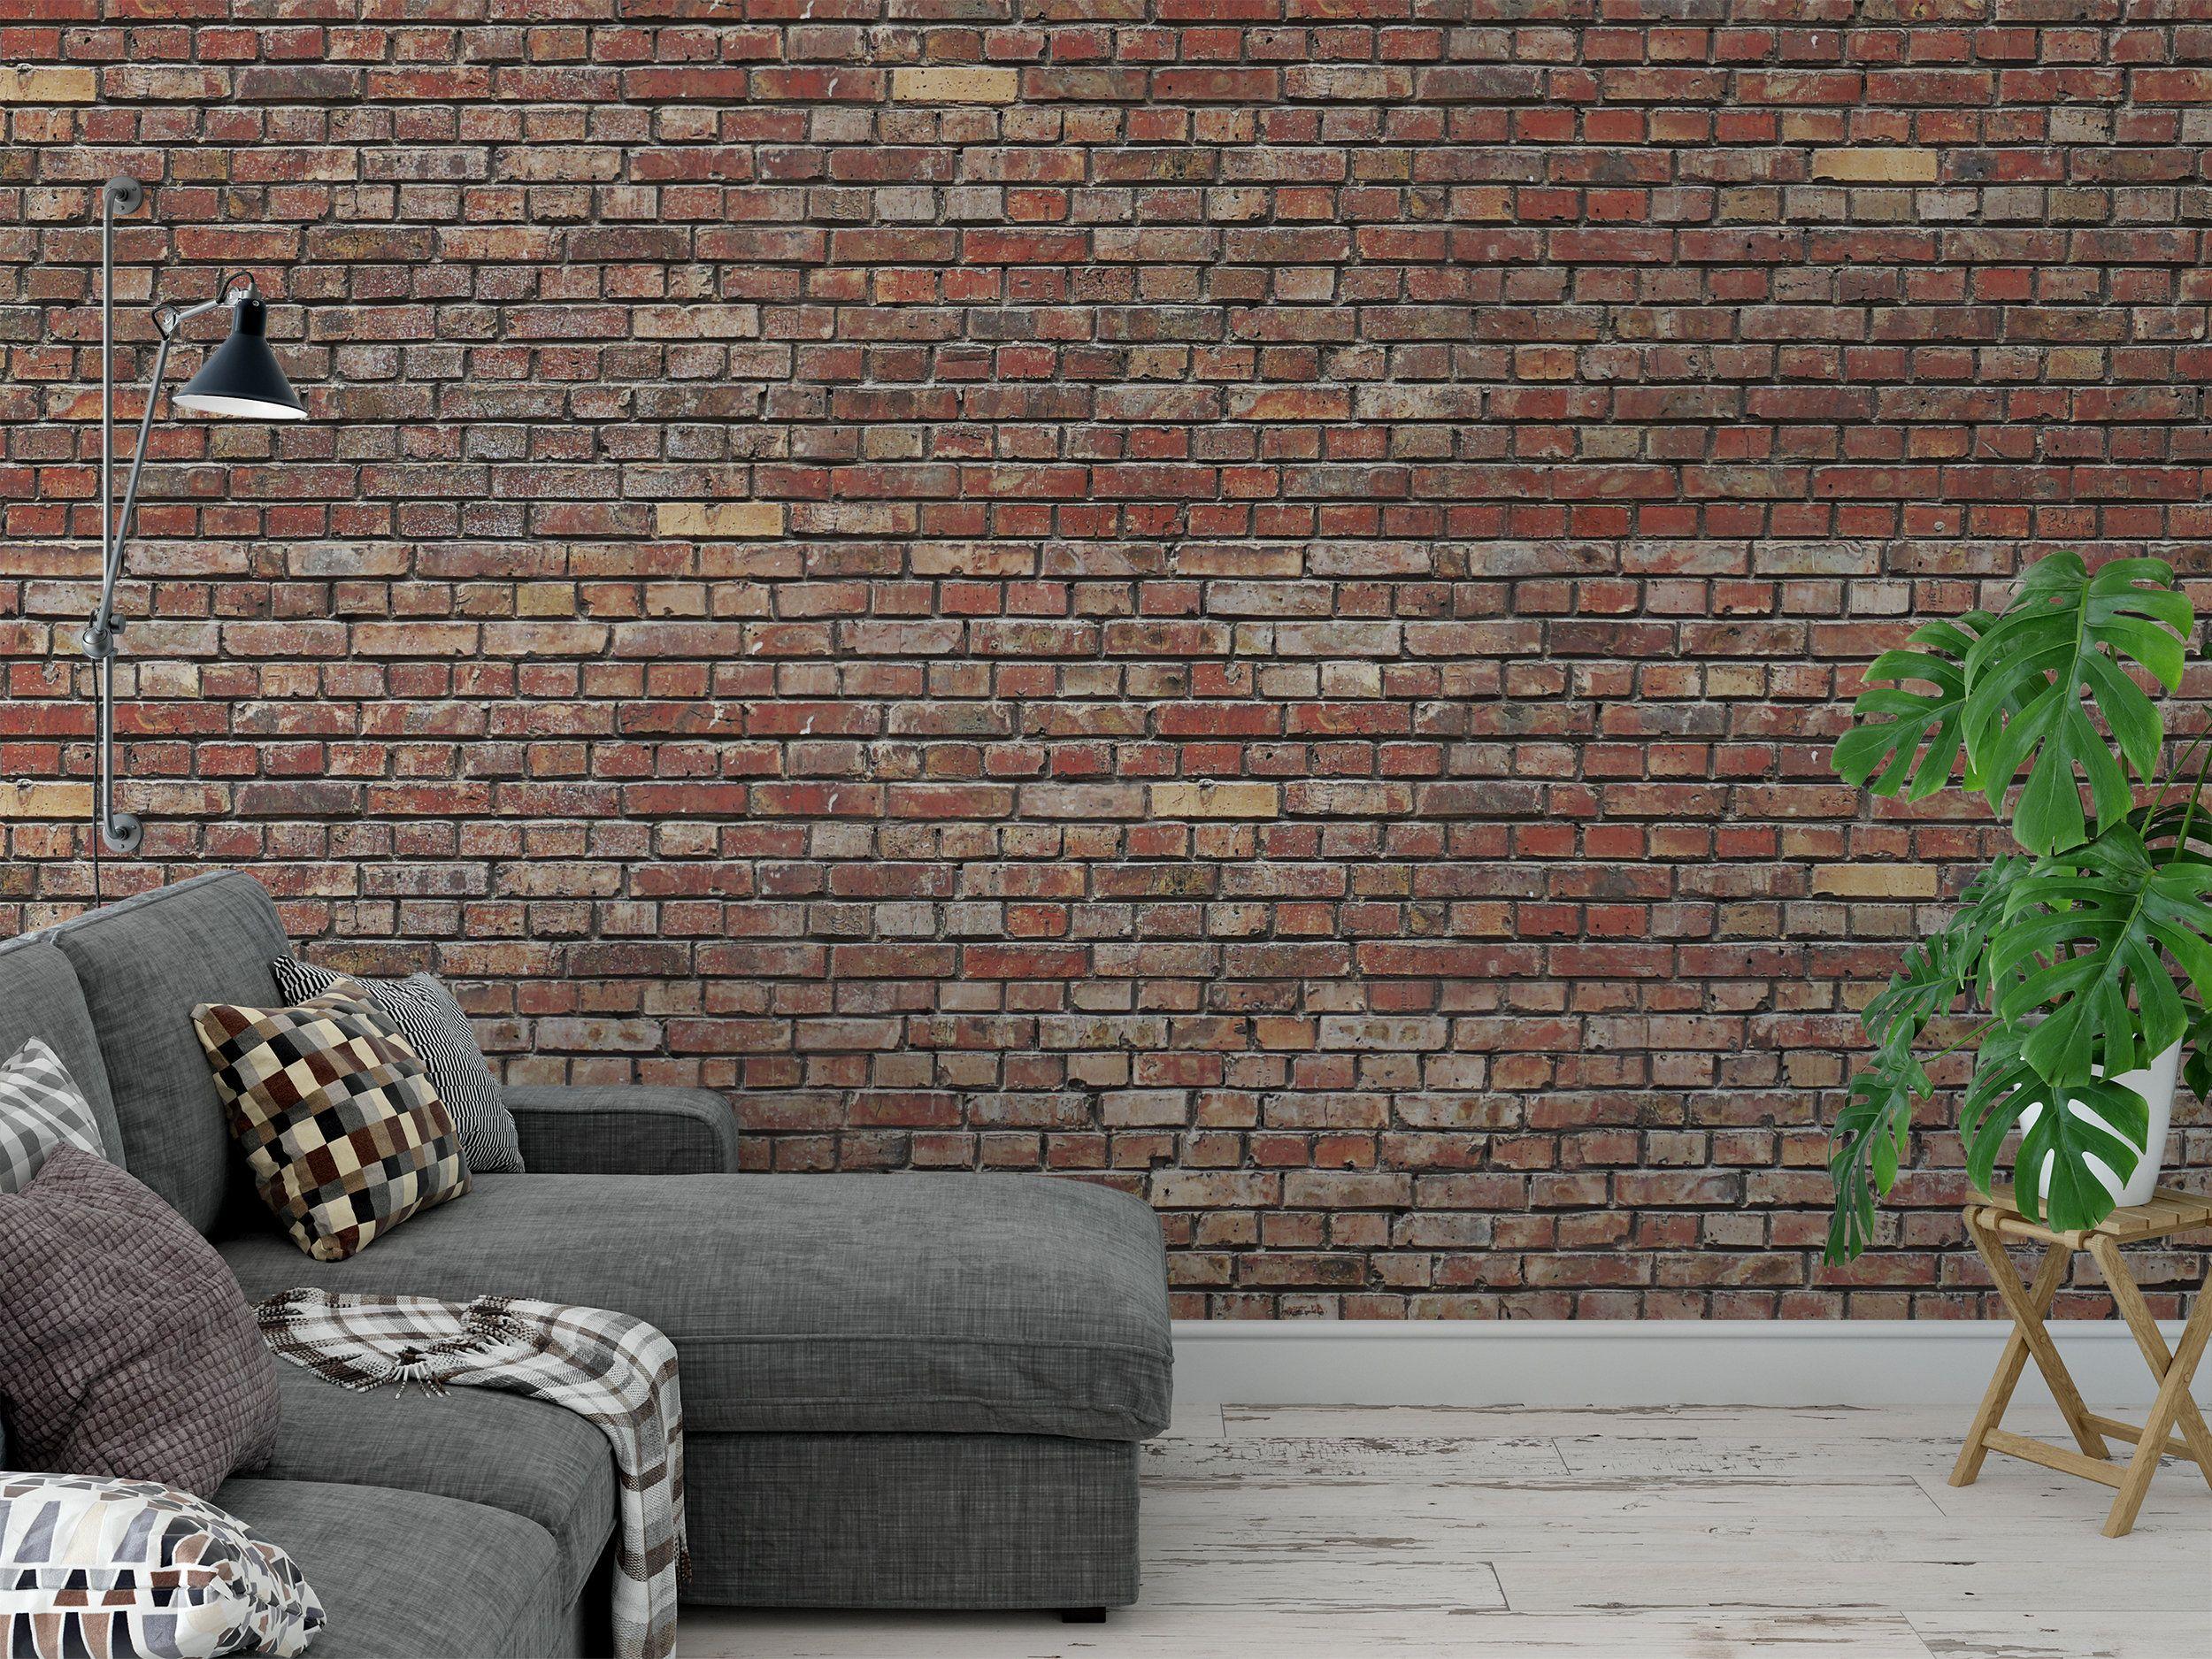 Removable Peel And Stick Wallpaper Red Brick Pattern Etsy Brick Patterns Red Brick Wallpaper Red Bricks